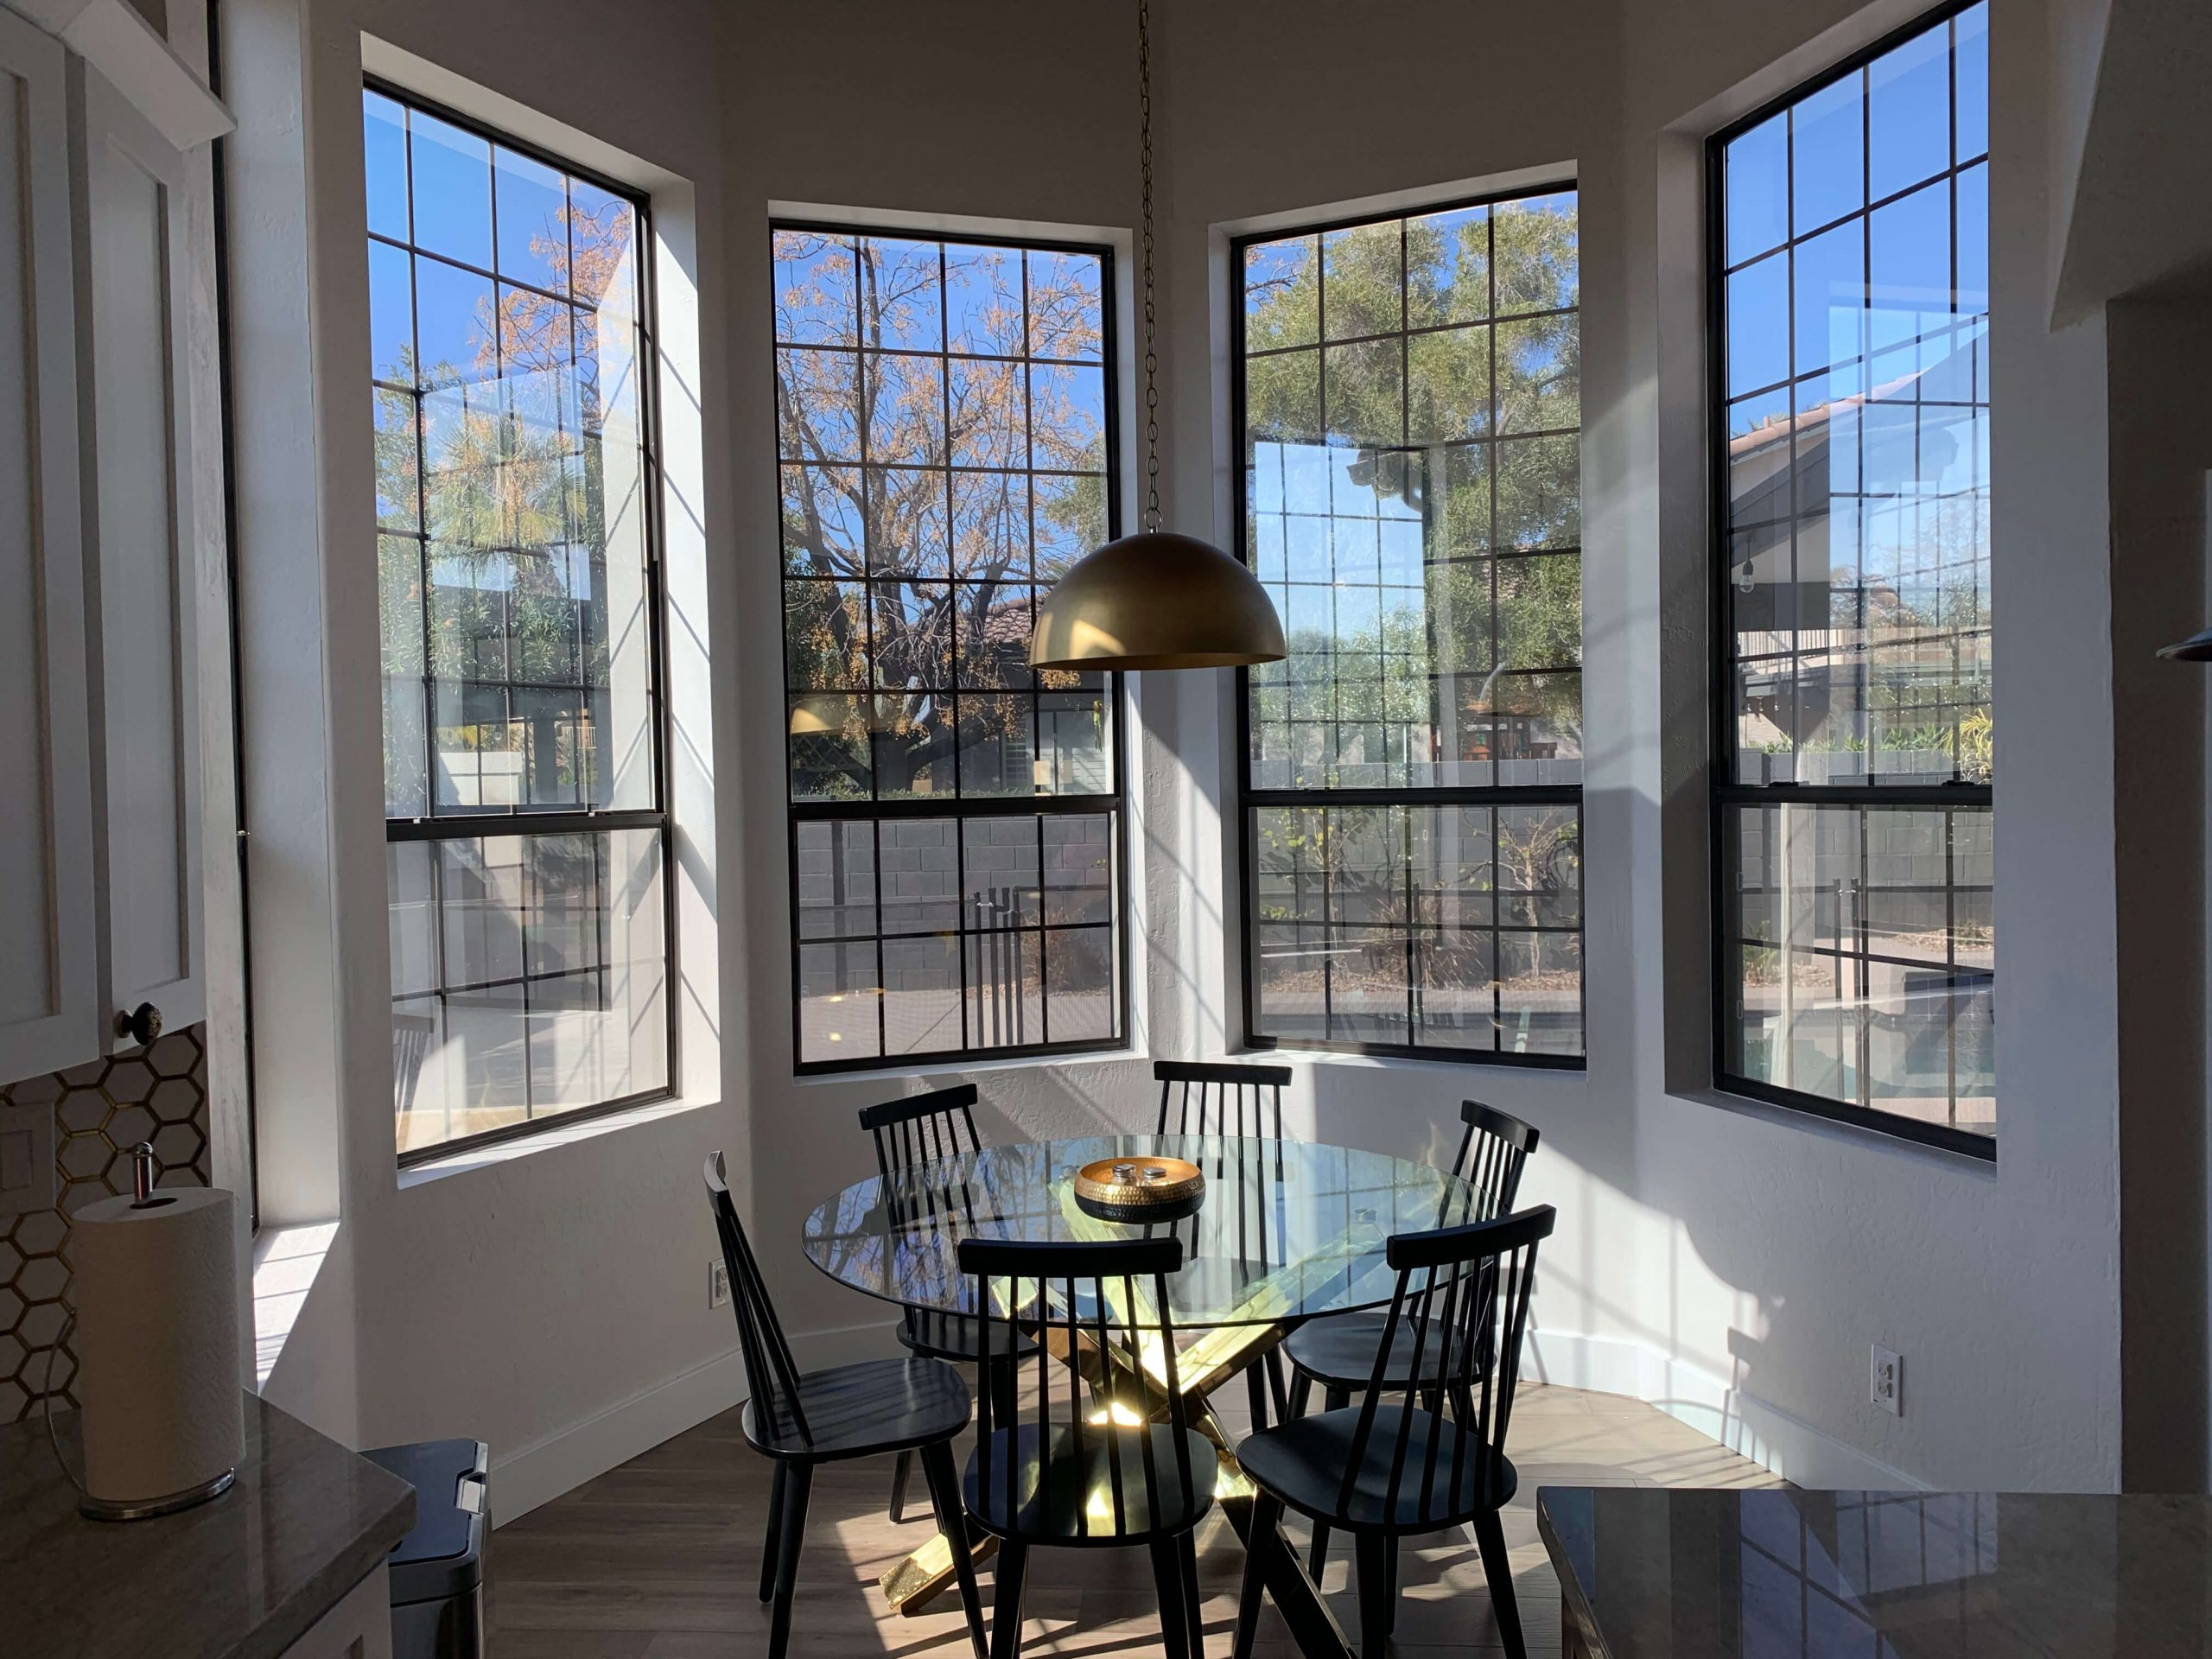 Solar Control Window Tint